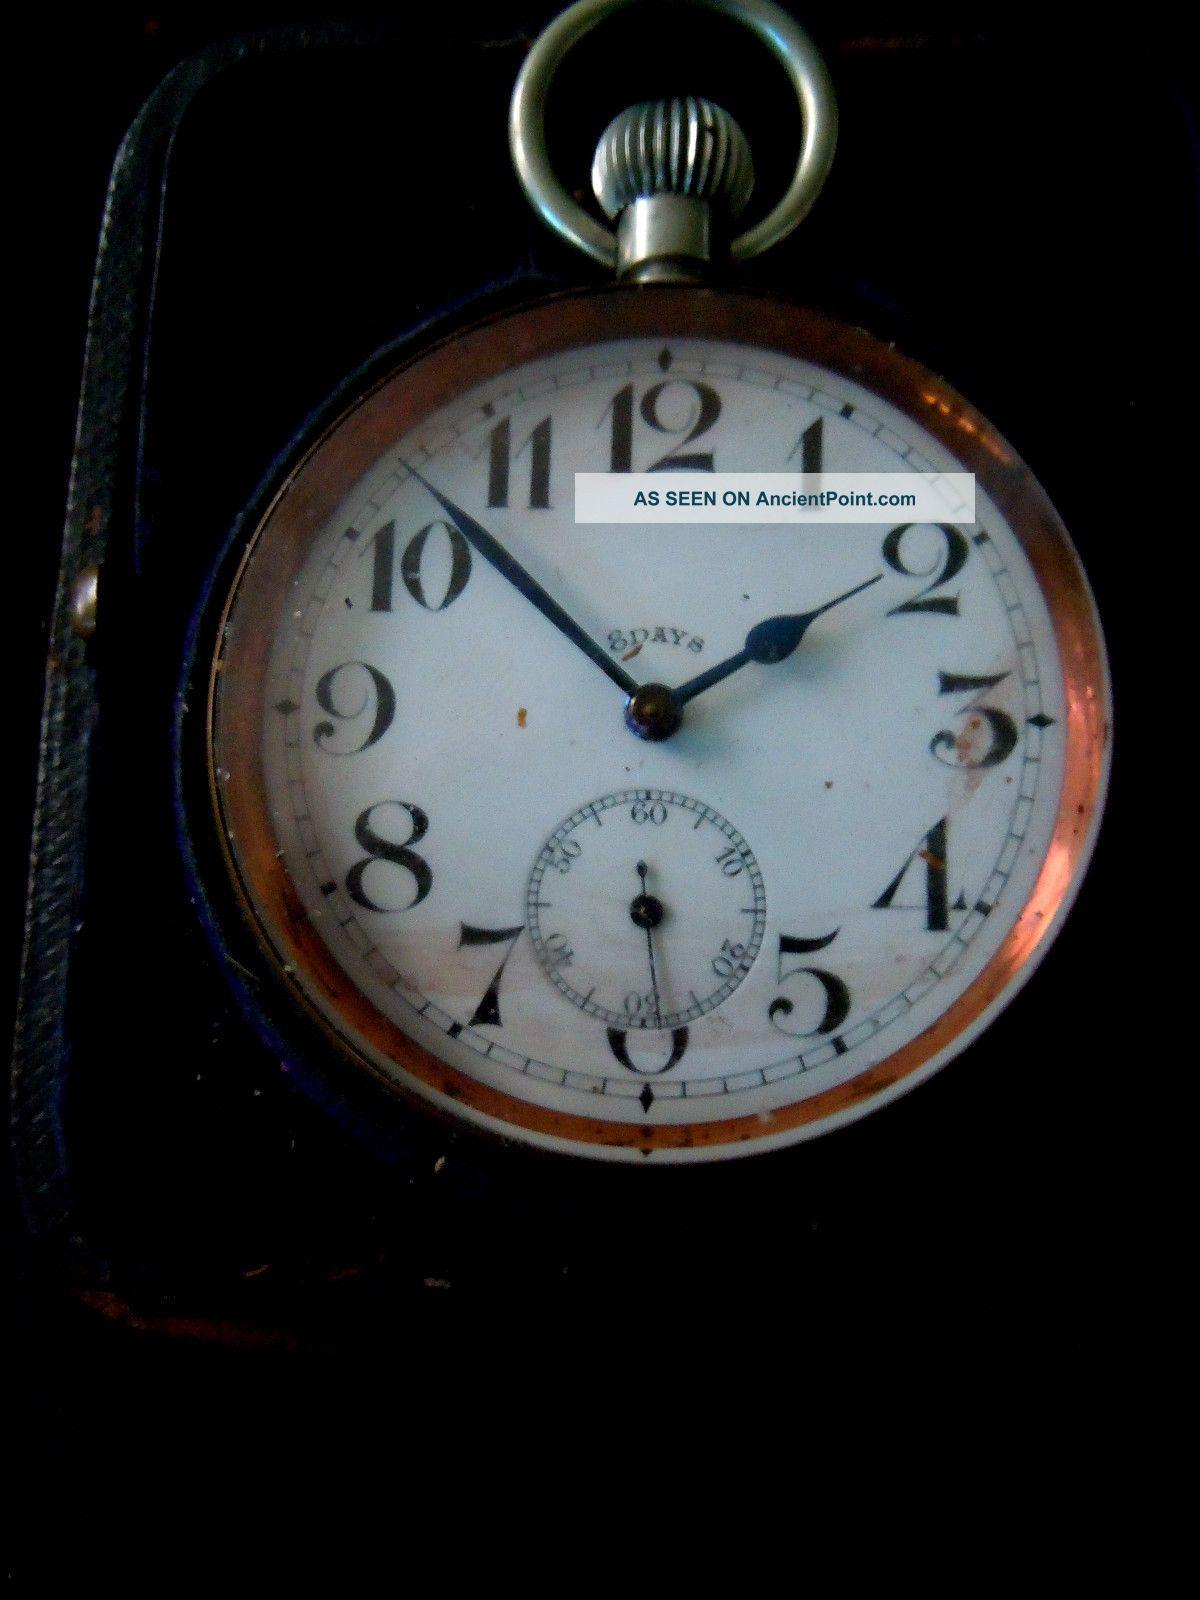 Antique Edwardian Case & Goliath Nickel Silver Pocket Watch Good Working Order Pocket Watches/ Chains/ Fobs photo